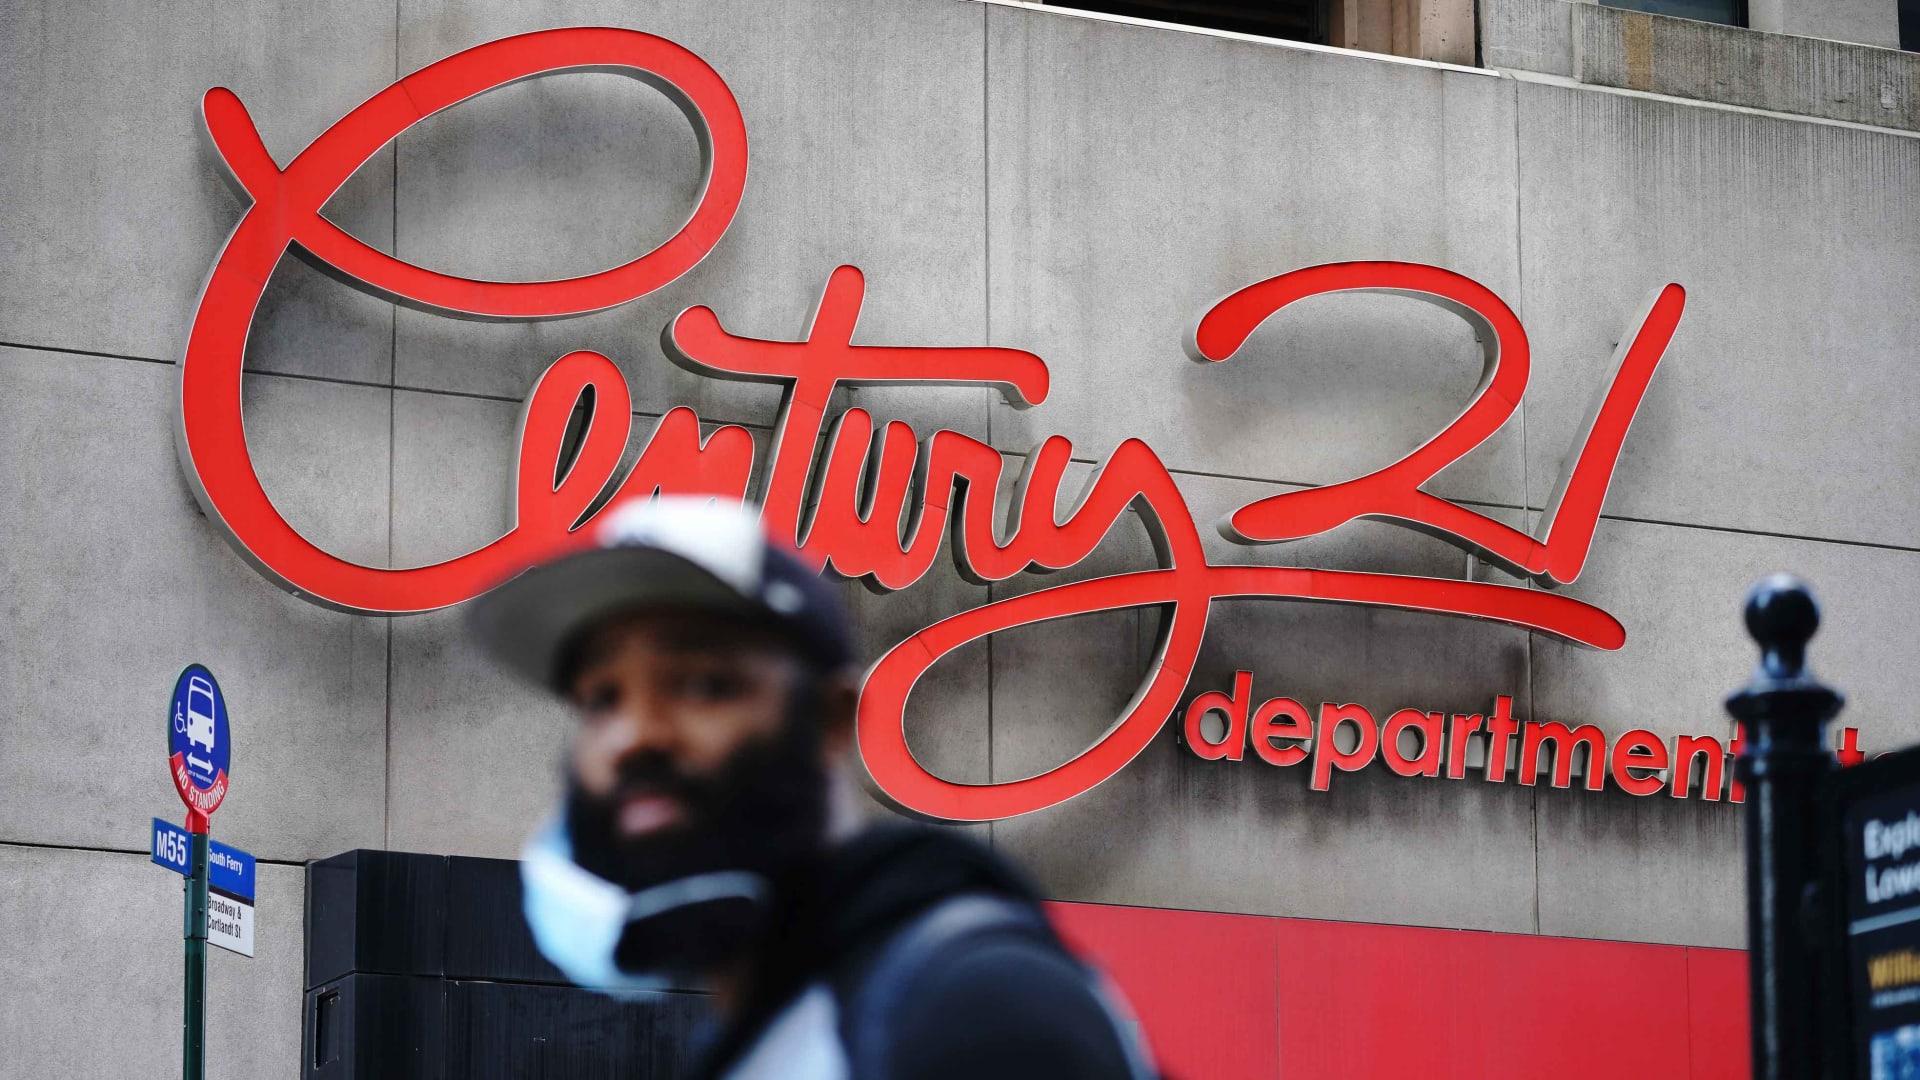 Century 21 department store in Lower Manhattan.